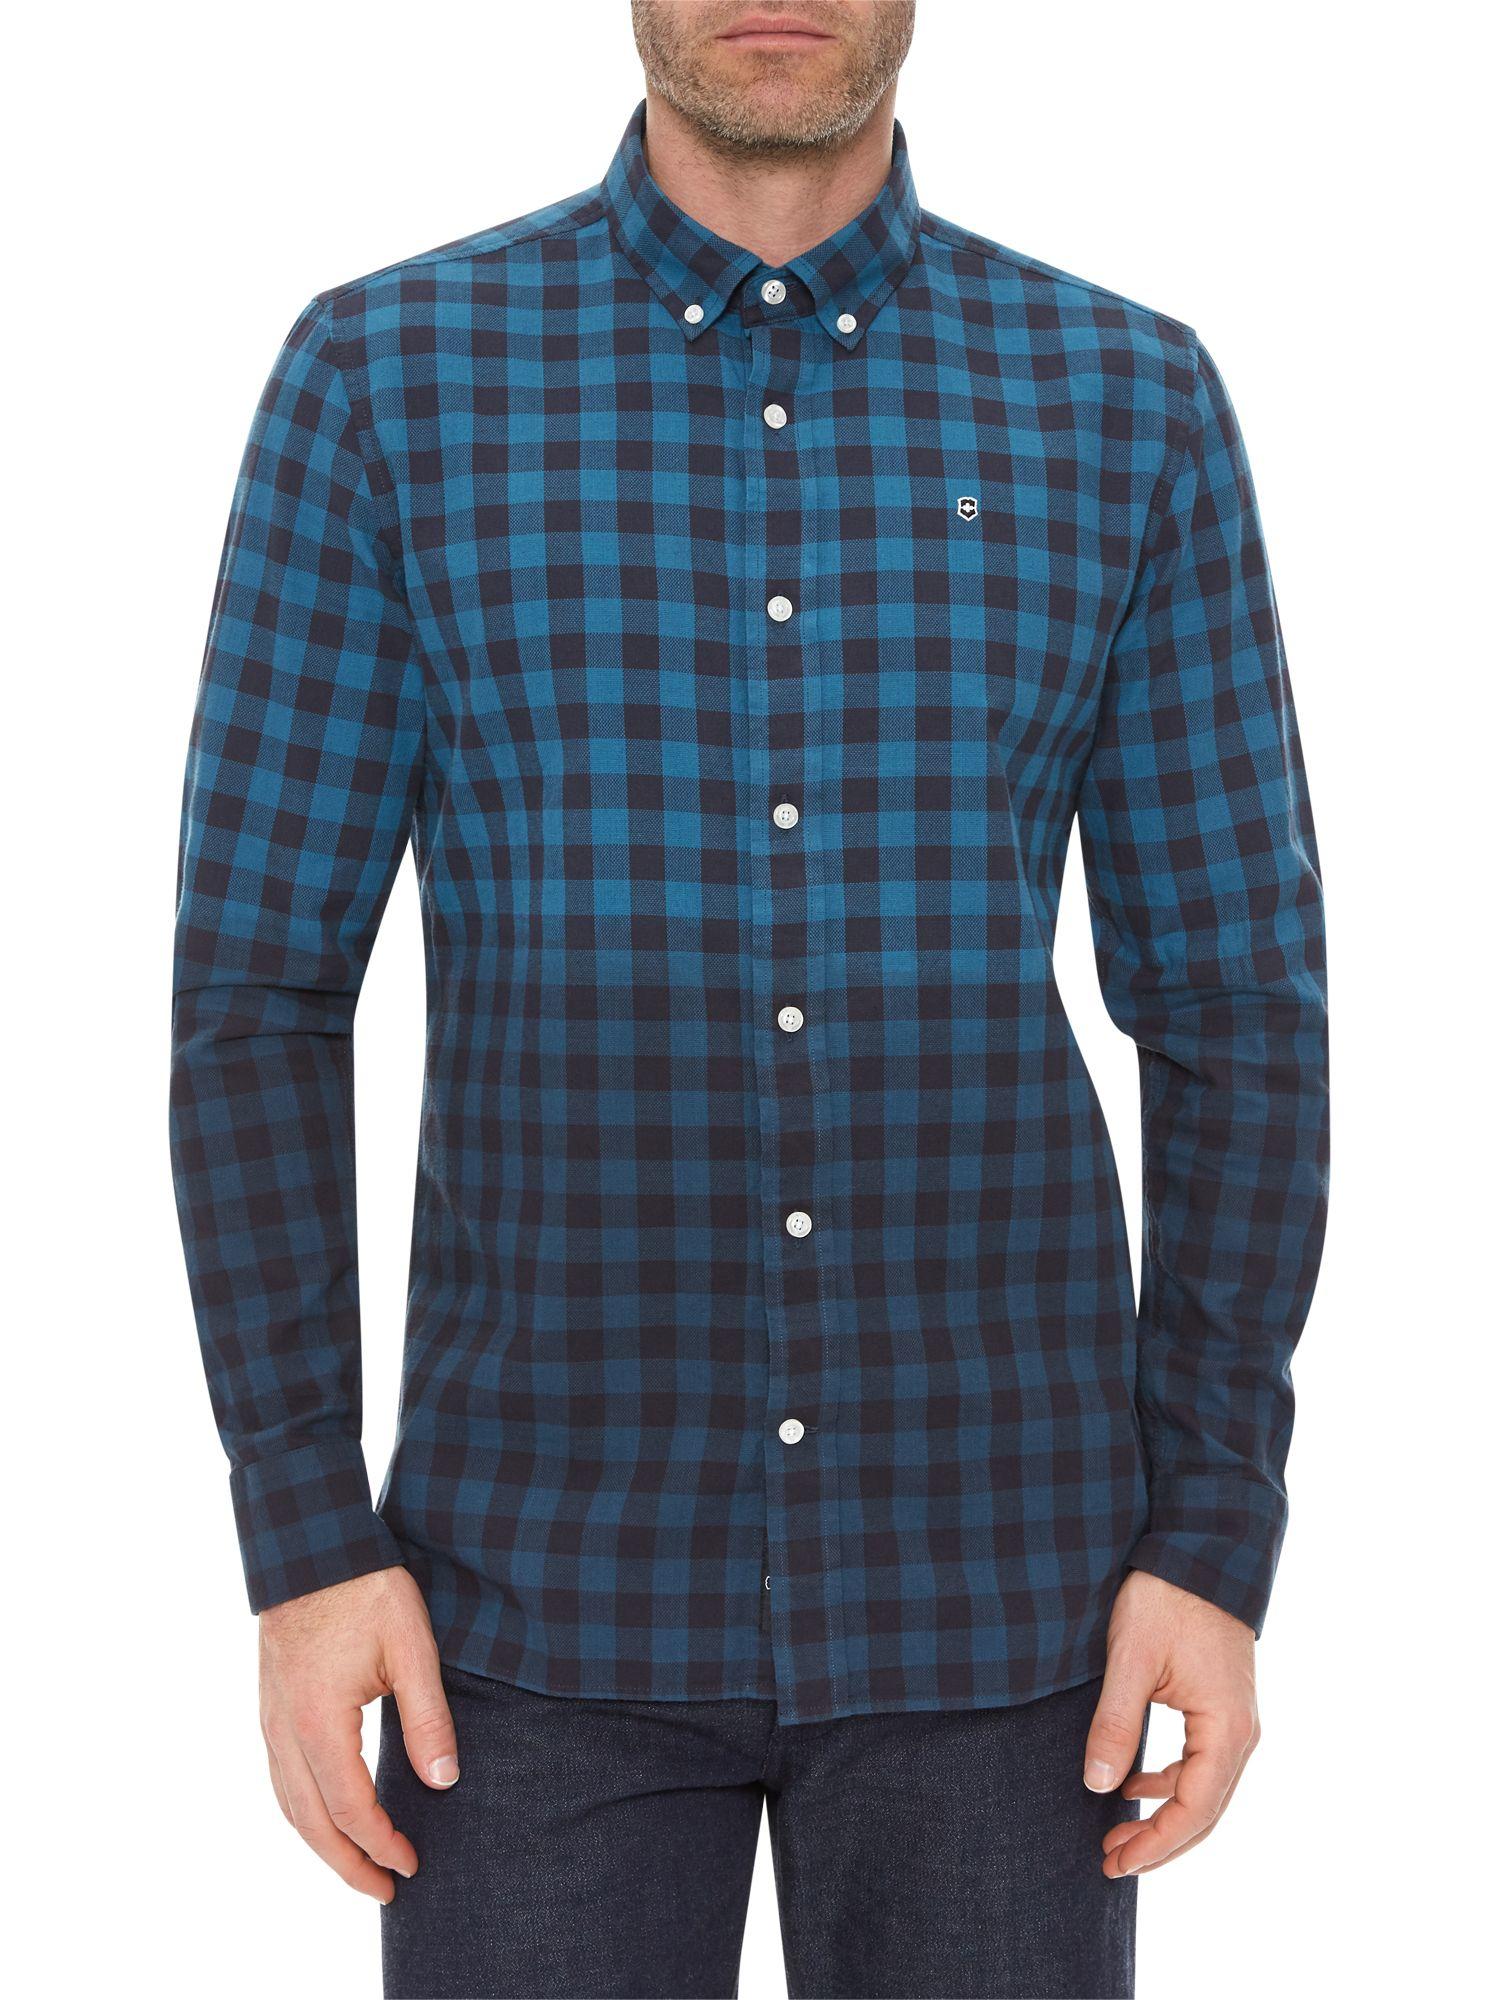 Lyst victorinox check dip dye shirt in blue for men for Mens dip dye shirt